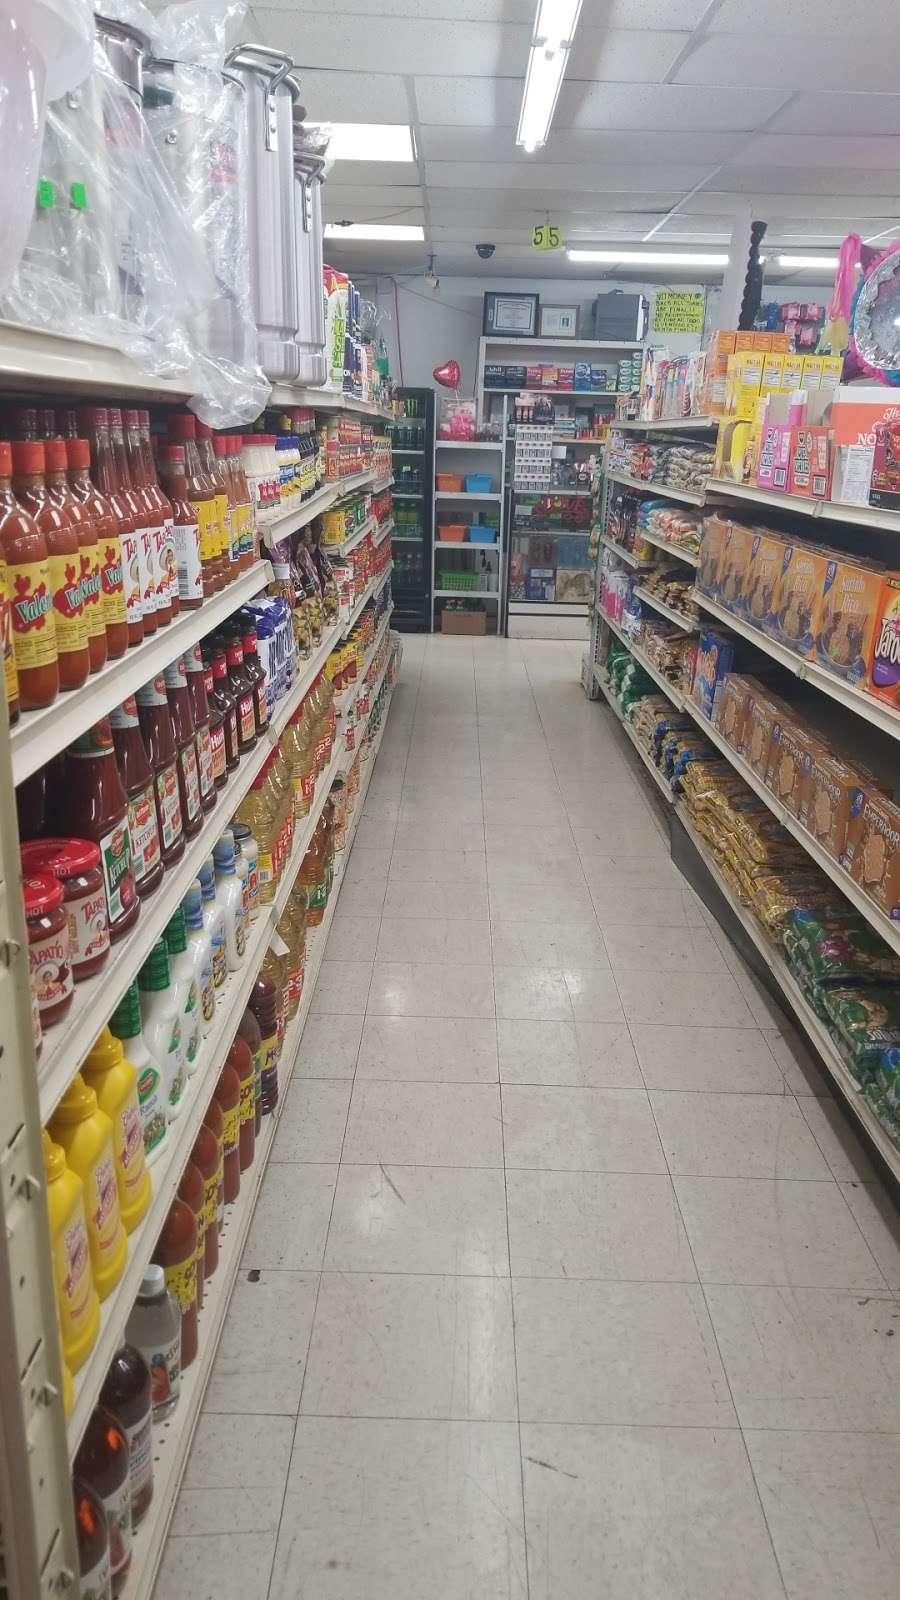 Latino Market - convenience store  | Photo 2 of 10 | Address: 7806 N 27th Ave, Phoenix, AZ 85051, USA | Phone: (602) 973-5326